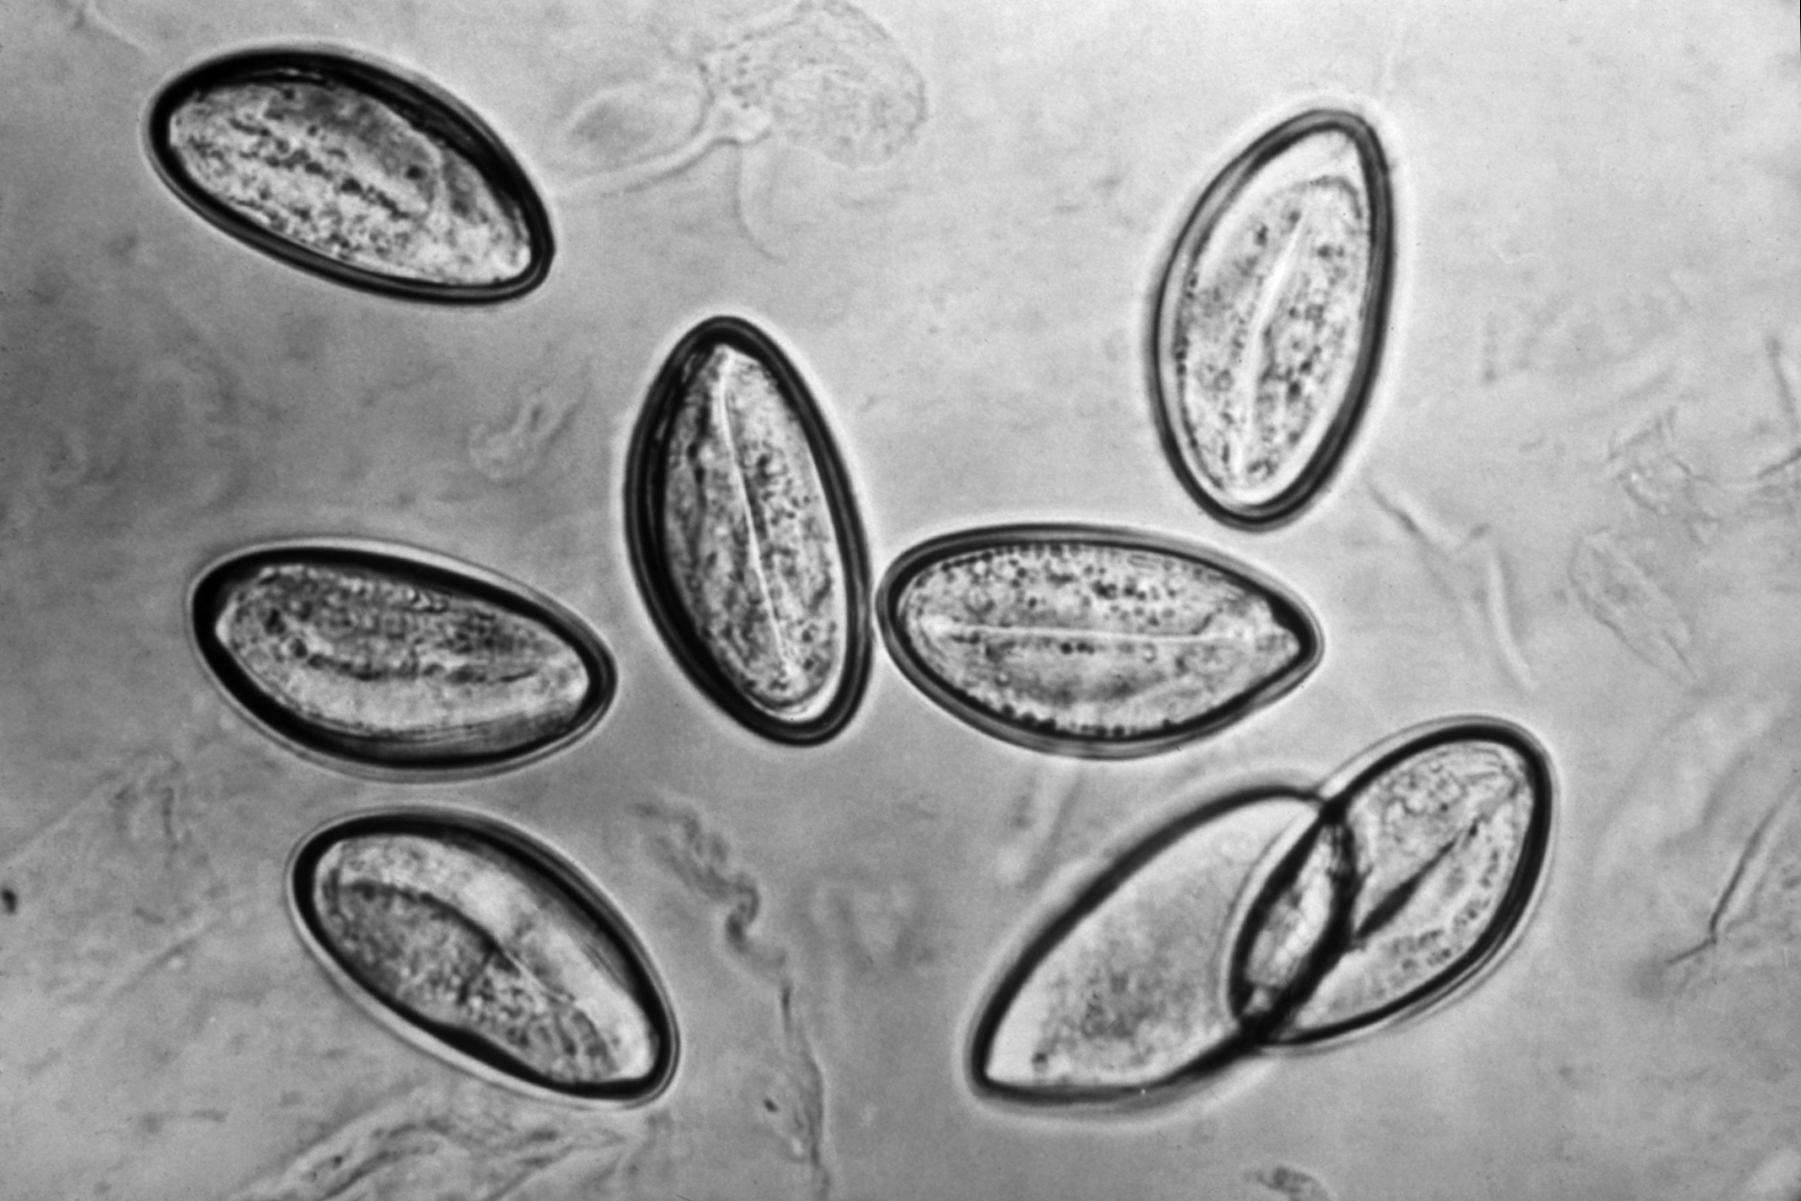 enterobius vermicularis pictures hpv impfung jungen krankenkasse